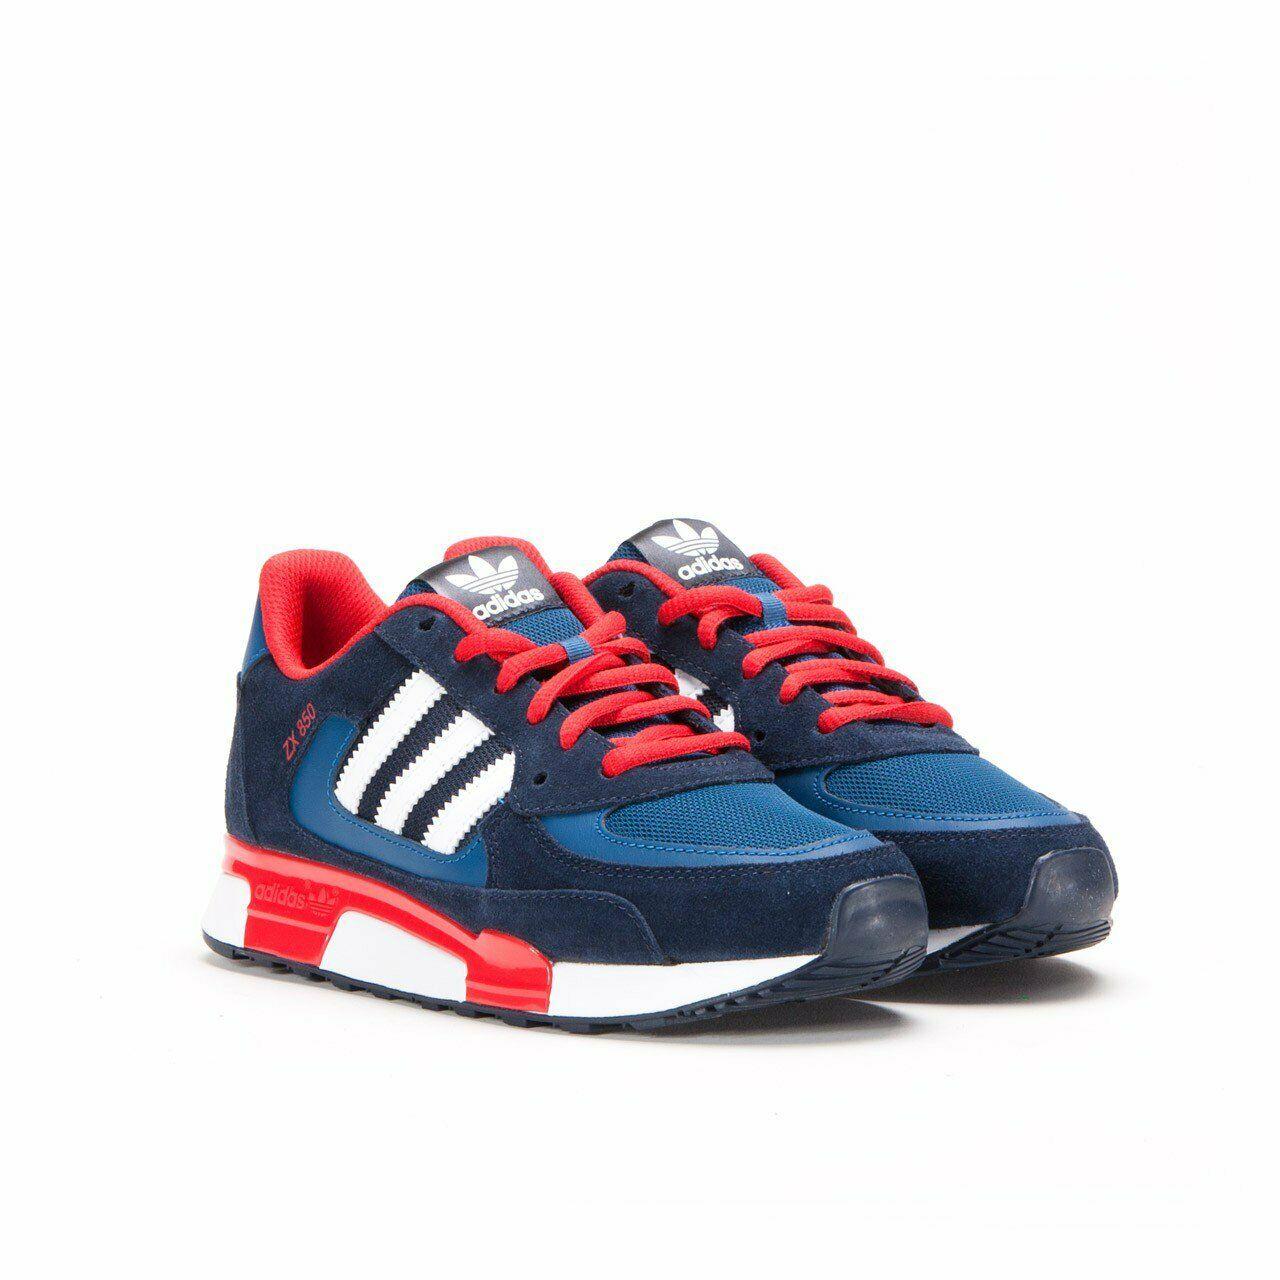 adidas uomo scarpe zx 850